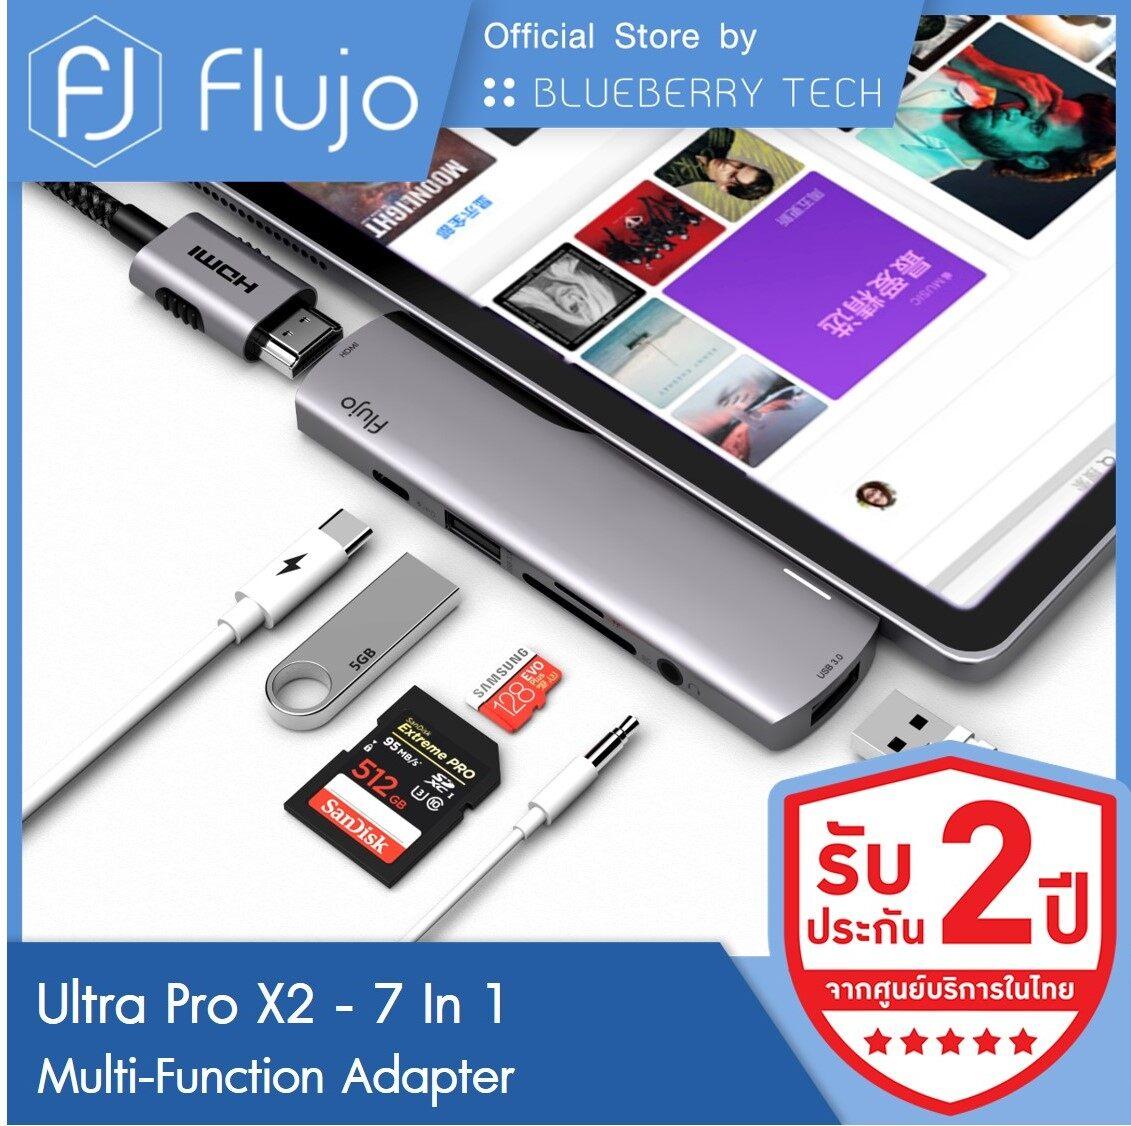 Flujo รุ่น Ch-63 ตัวแปลง Usb Type C Hub Flujo Ultra Pro X2 - 7 In 1 Multi-Function Adapter, 1 X Usc Power Delivery (pd 60w), 1 X Hdmi 4k, Sd/tf Card Reader, 2 X Usb 3.0, 1 X 3.5mm Audio Jack รับประกัน 2 ปี ศูนย์ไทย.